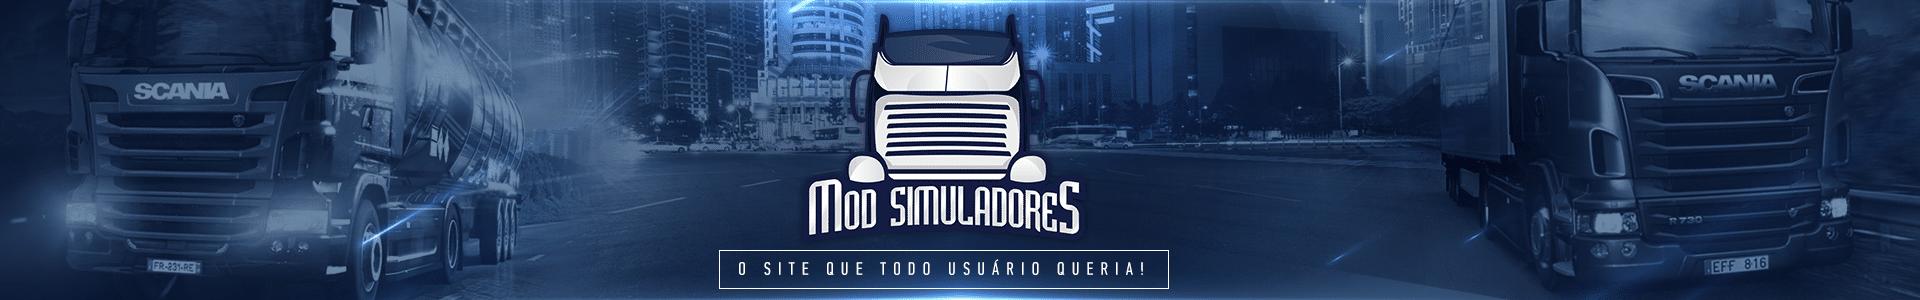 Baixar Mods para Euro Truck Simulator 2, Baixar Mods Farming Simulator 17, Baixar Mods American Truck Simulator, Mods ETS2, Mods FS17, Mods ATS